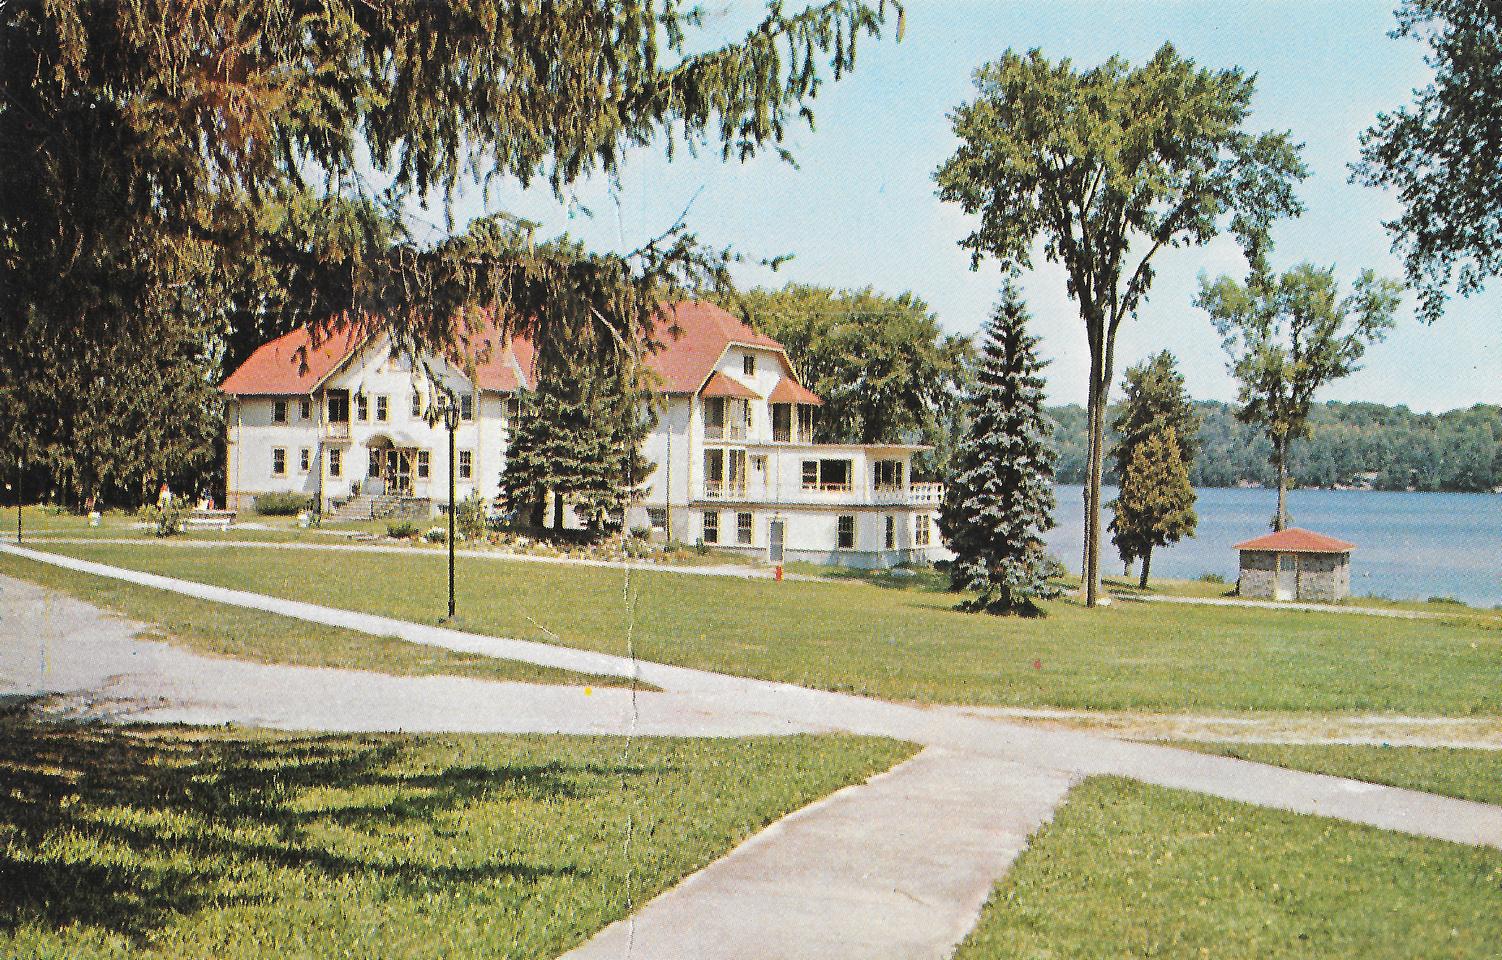 Michelle M. Murosky: The Postcard Collection &emdash; July 12, 1967